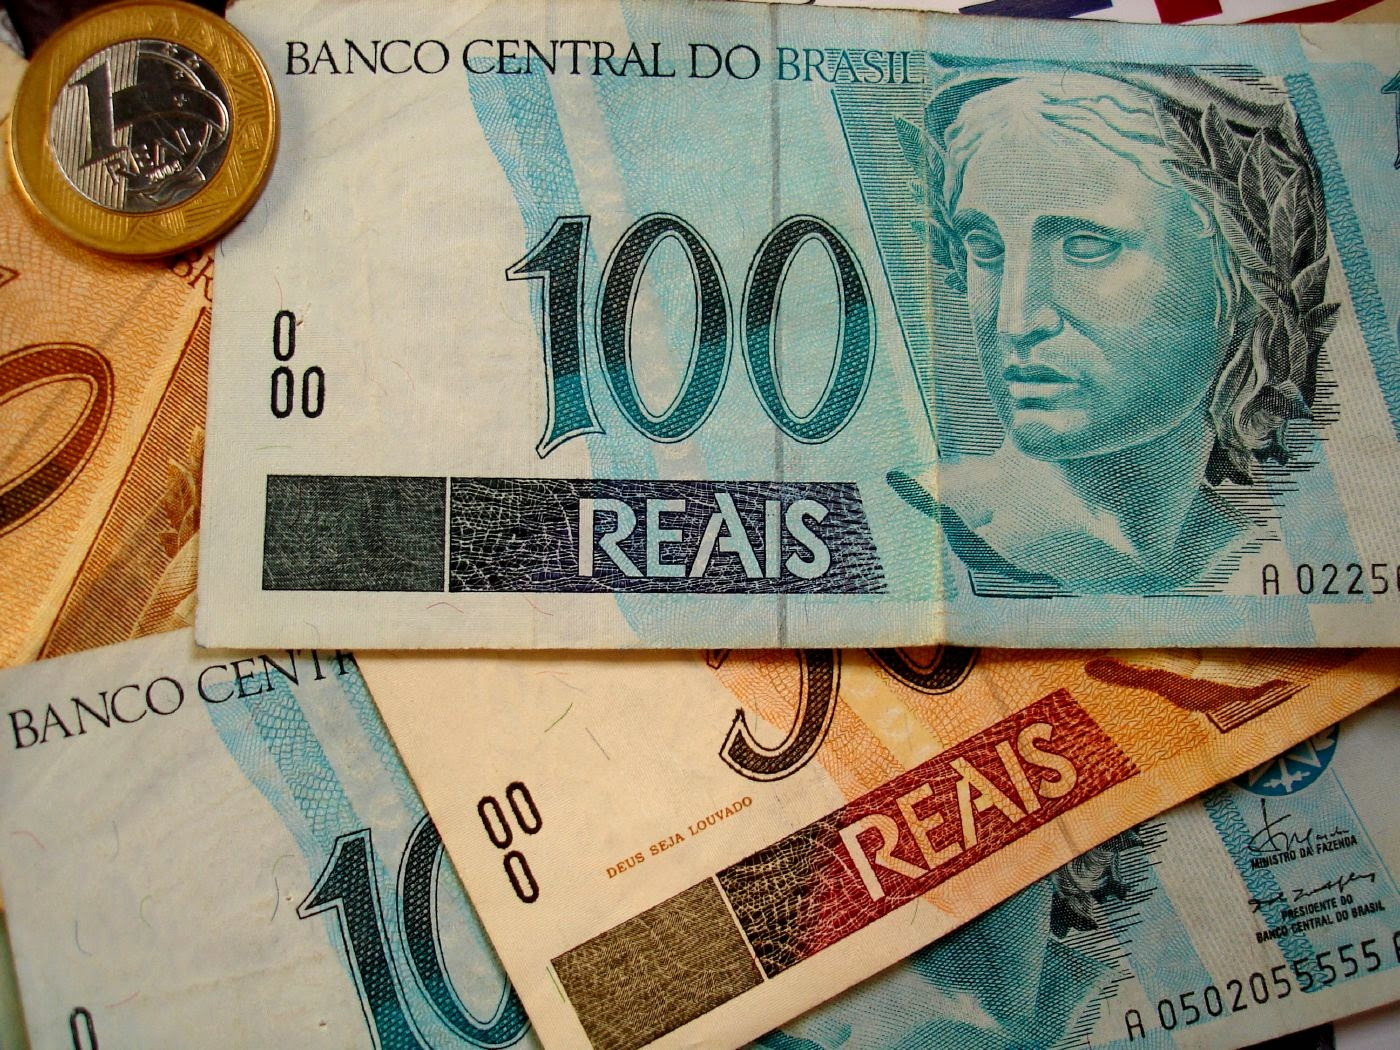 Бразилия, валута, реал